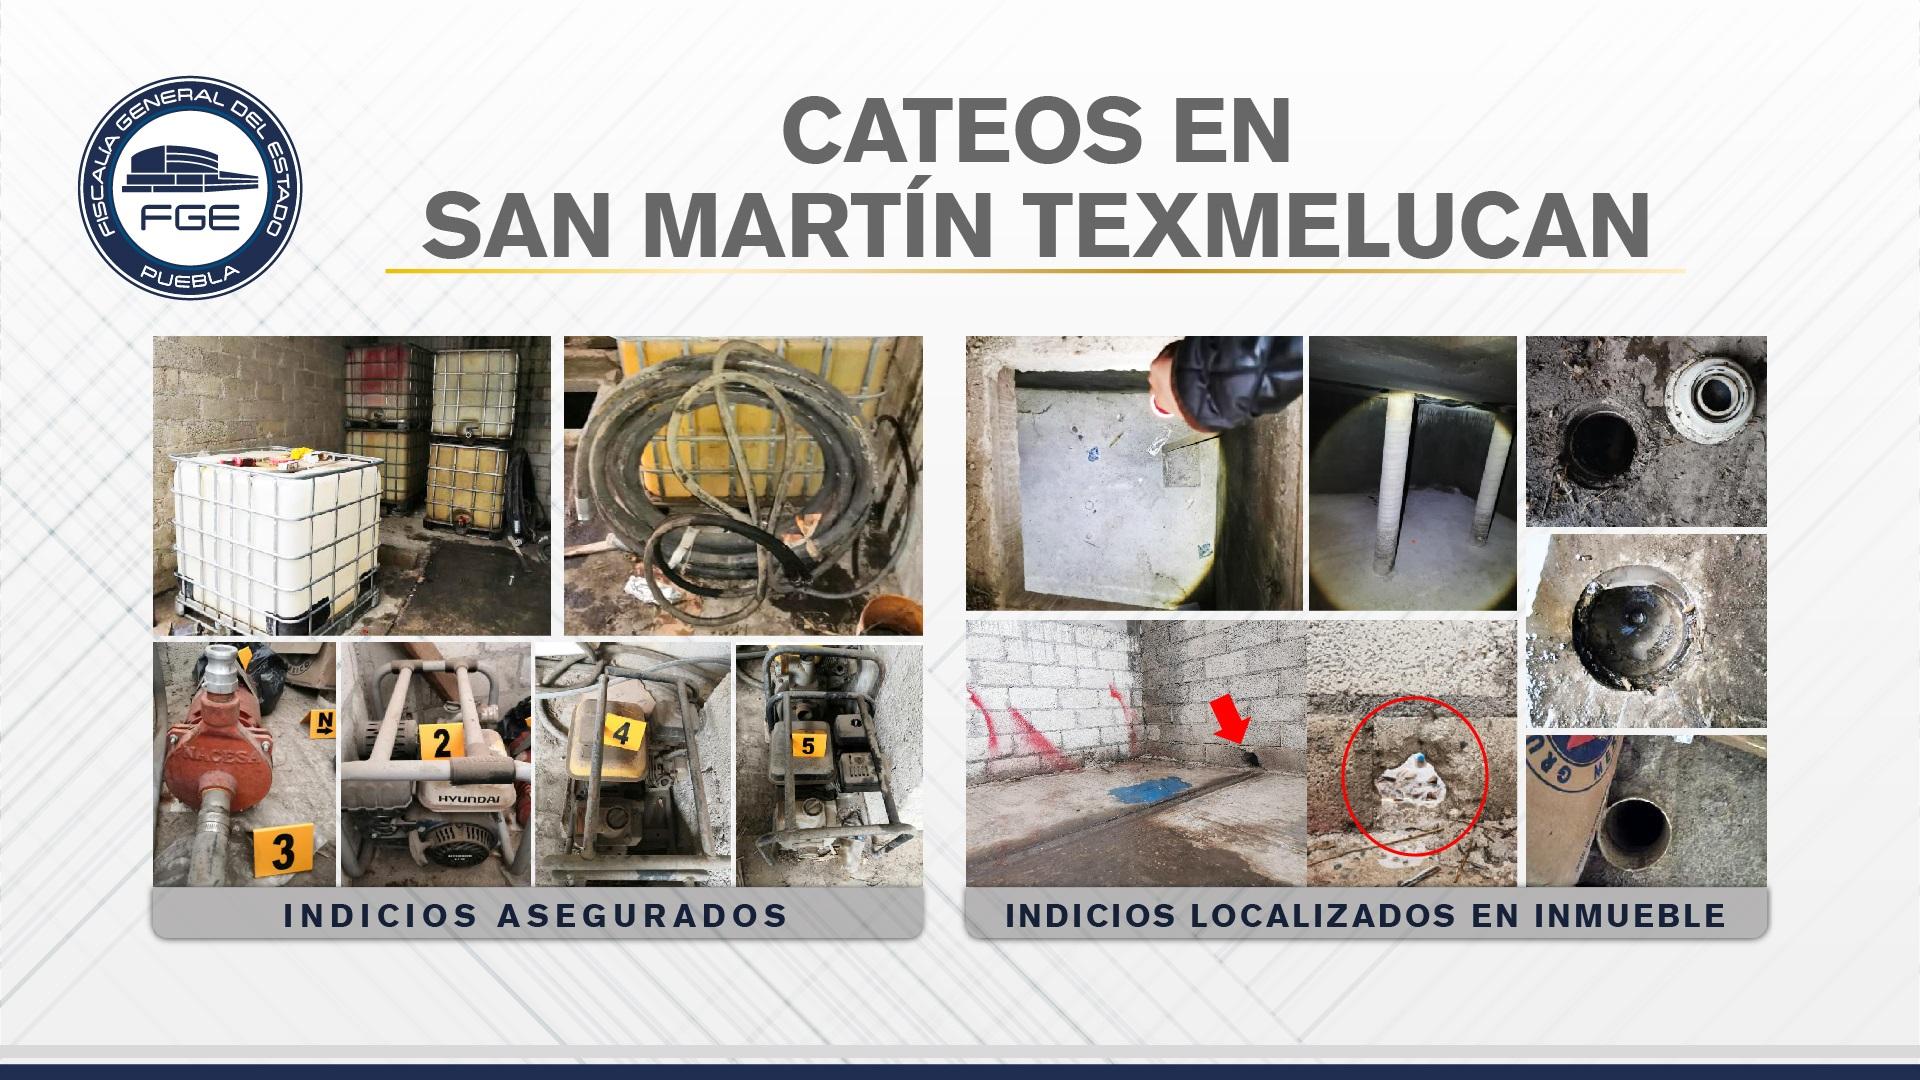 Cateos San Martín texmelucan 02